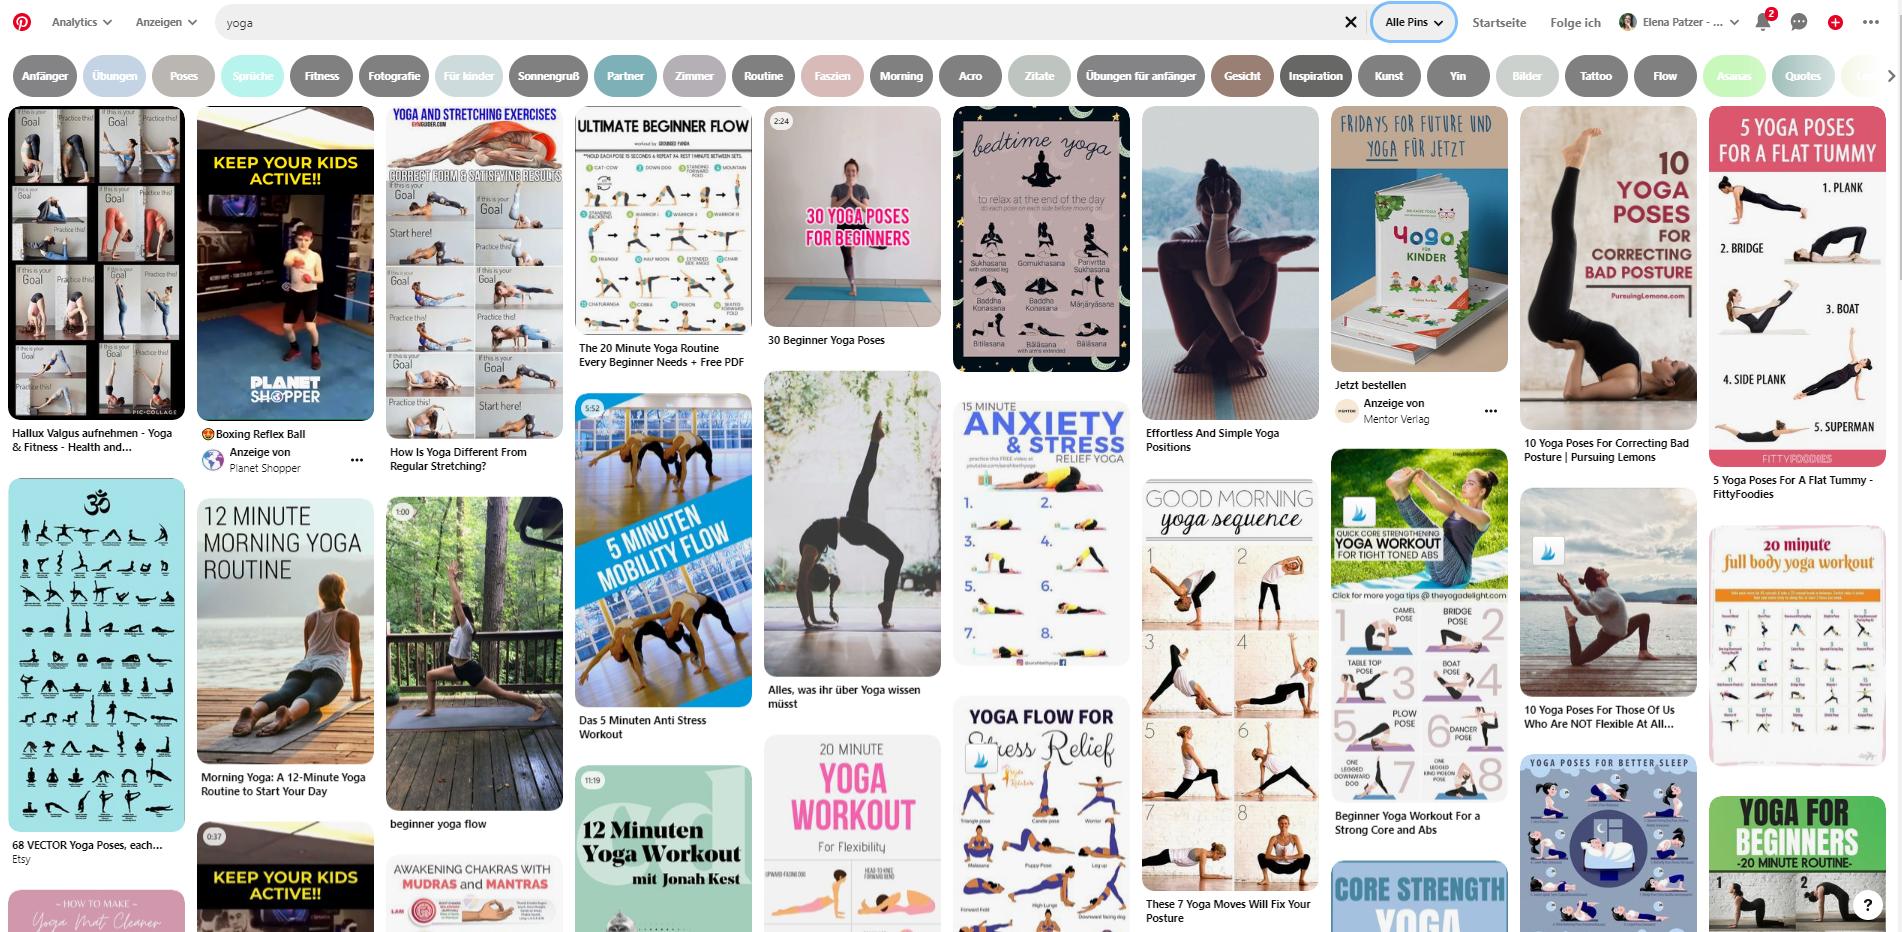 Blogartikel-Ideen zum Thema Yoga bei Pinterest